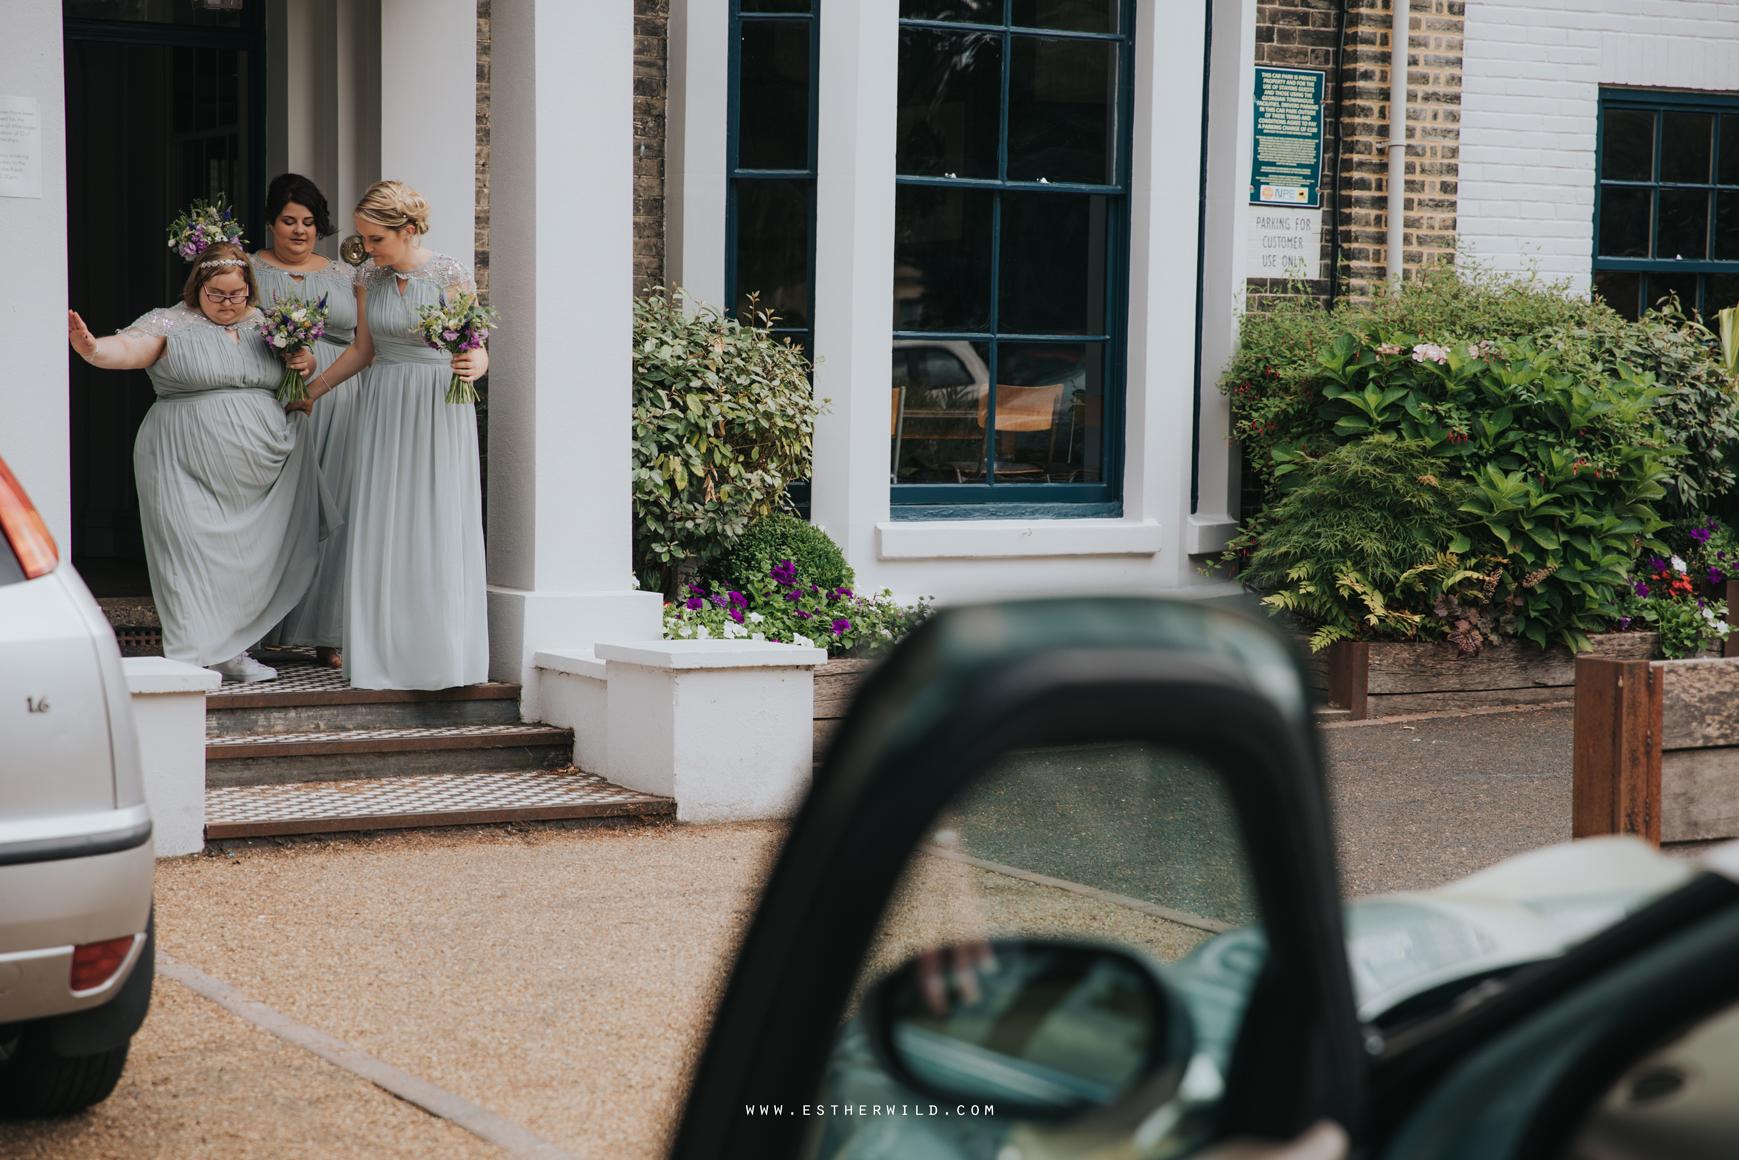 The_Georgian_Townhouse_Wedding_Norwich_Esther_Wild_Photographer_3R8A0730.jpg